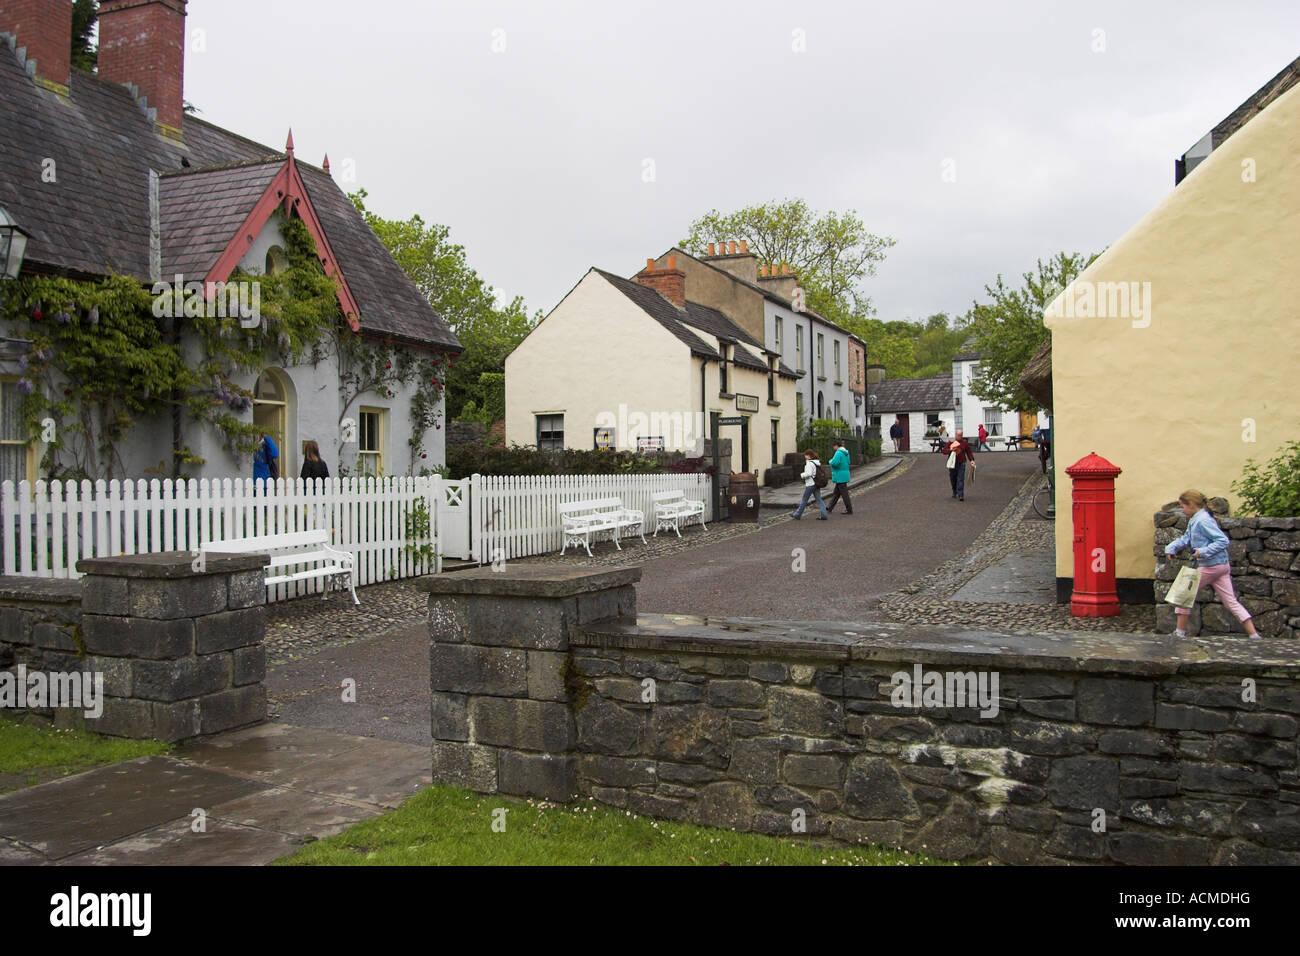 The 19th Century village street at Bunratty Folk Park Co Clare Ireland - Stock Image